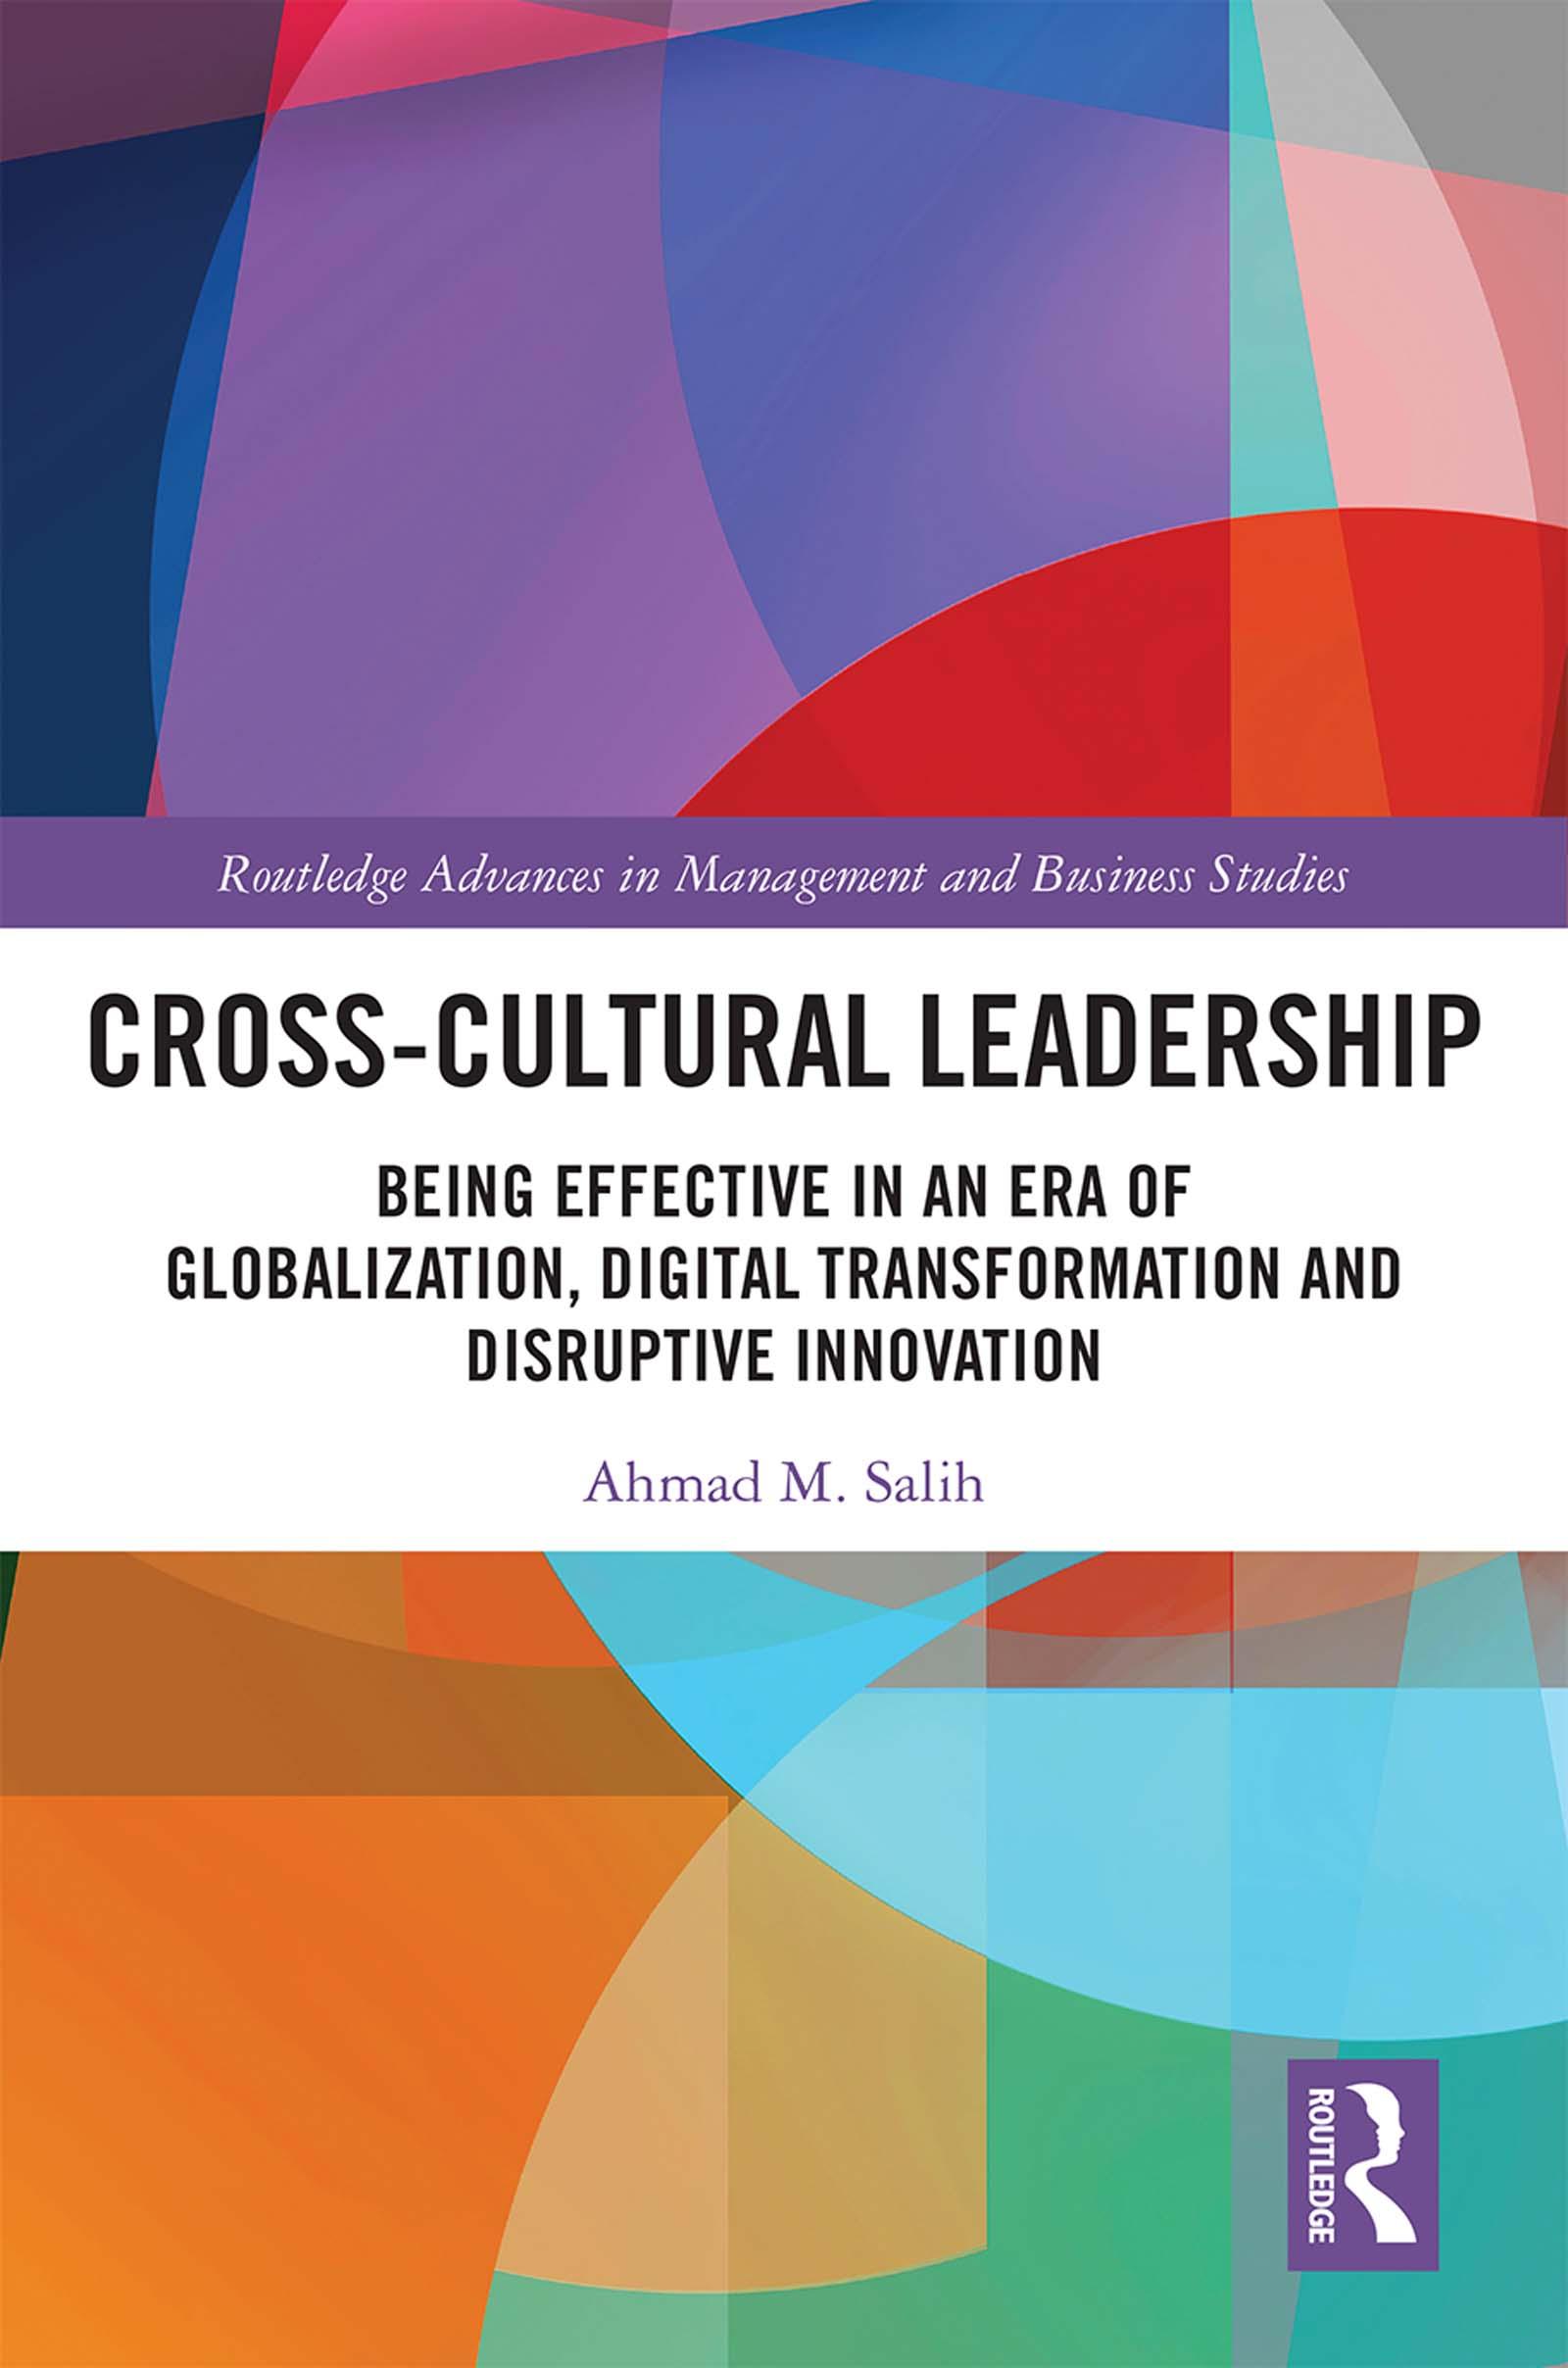 Cross-Cultural Leadership